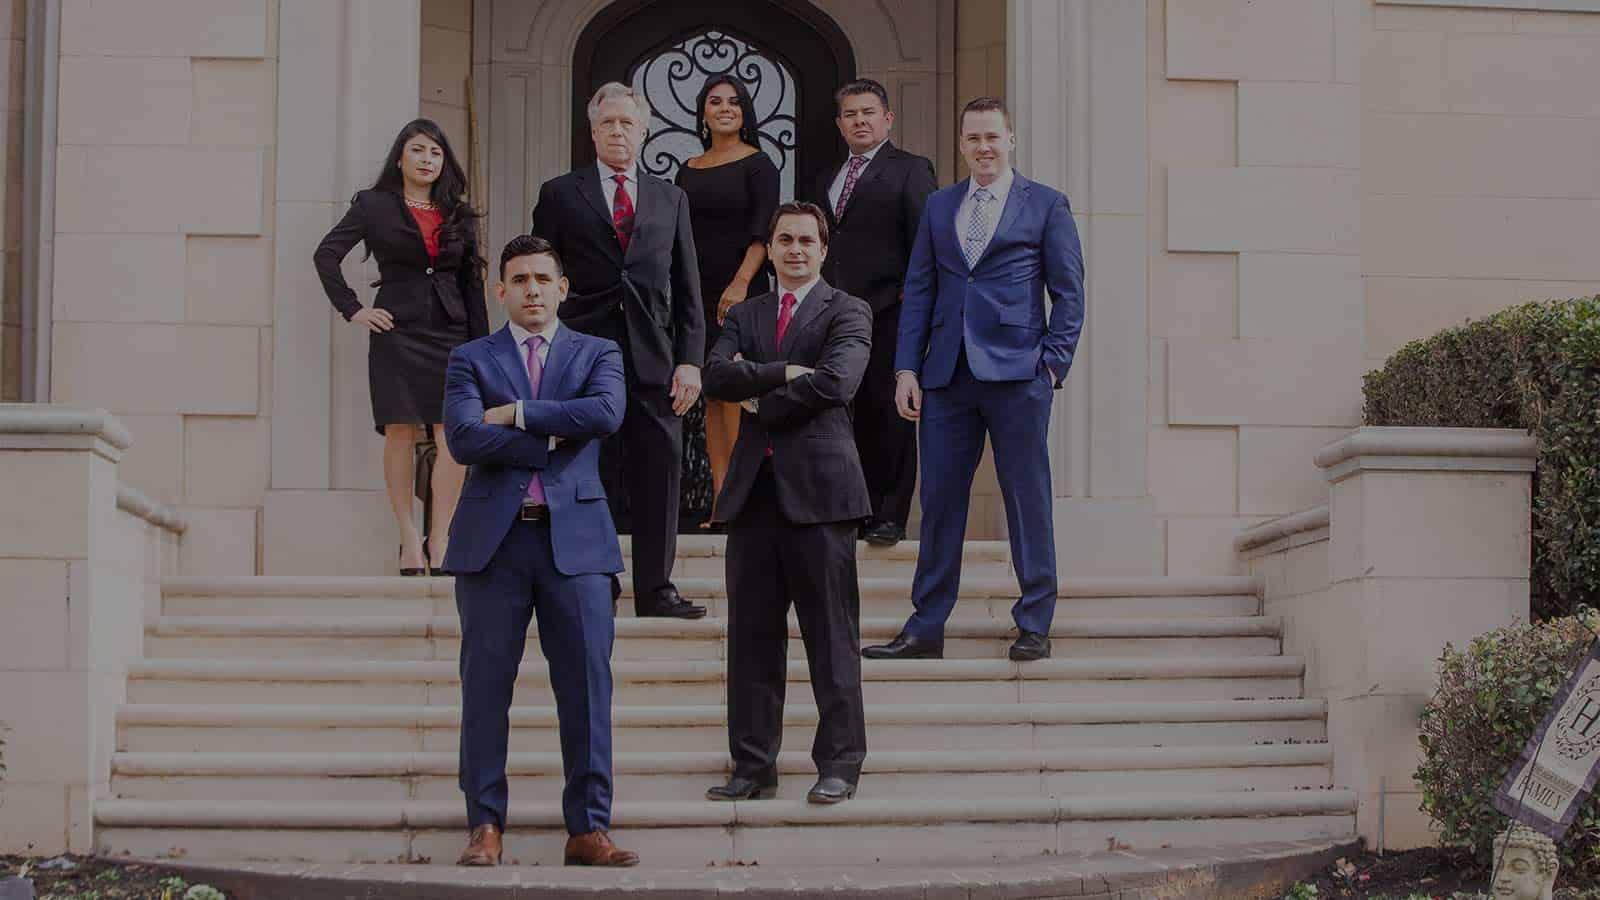 Juan Hernandez Law P.C. personal injury attorneys in Dallas TX